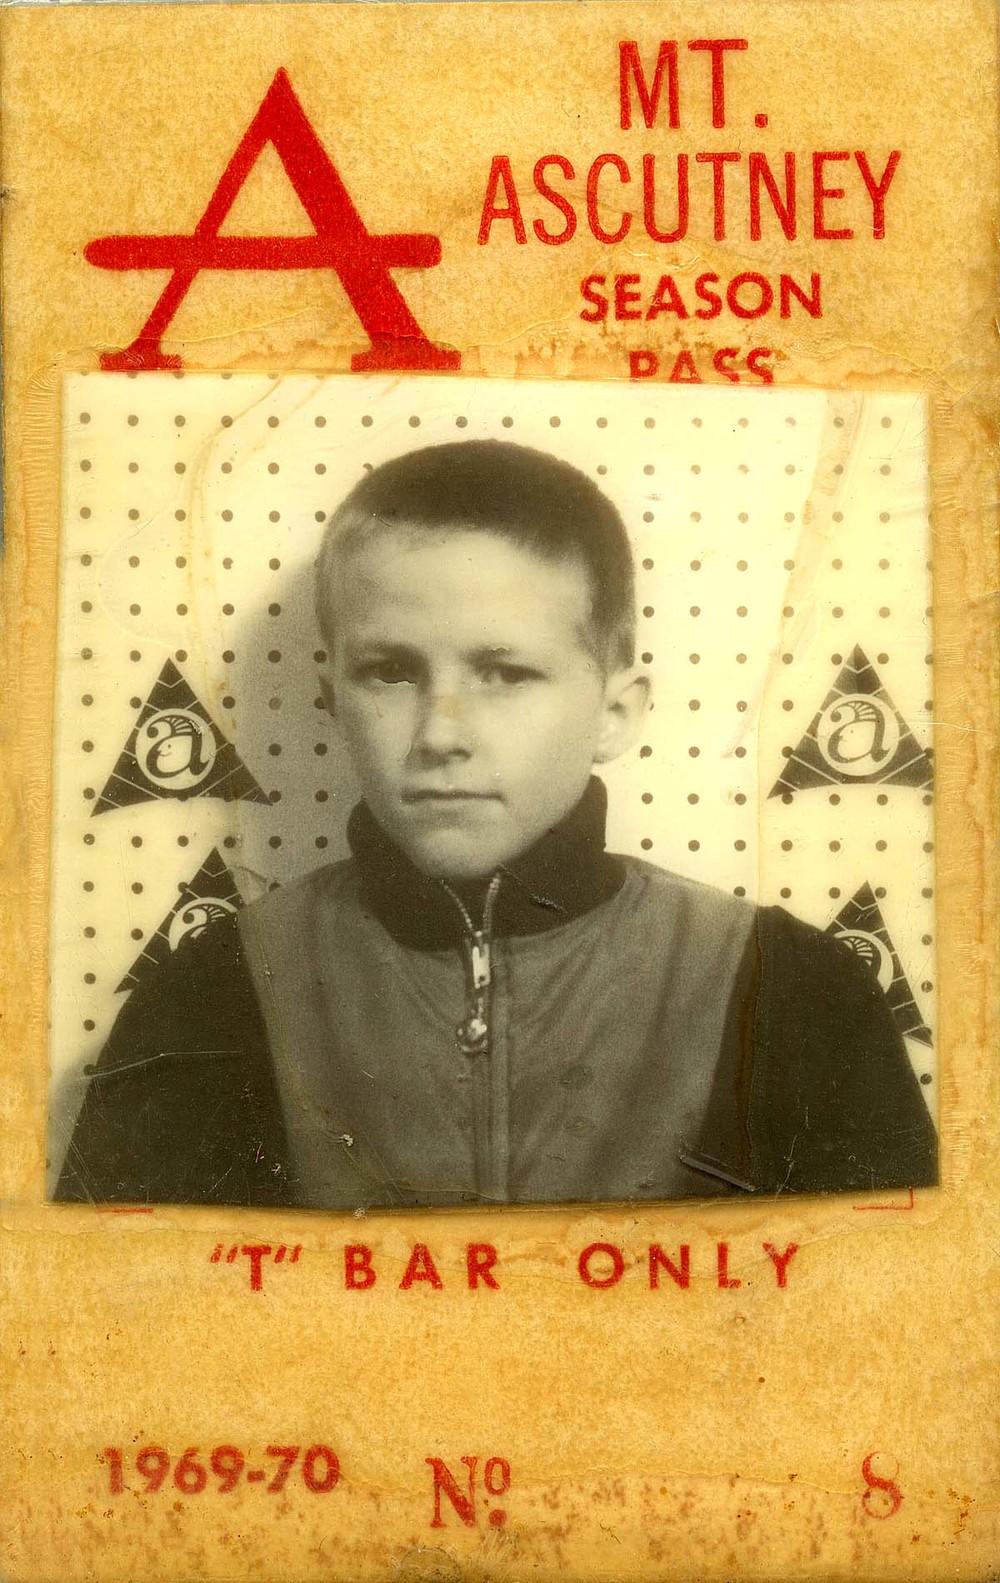 1969-70 season pass